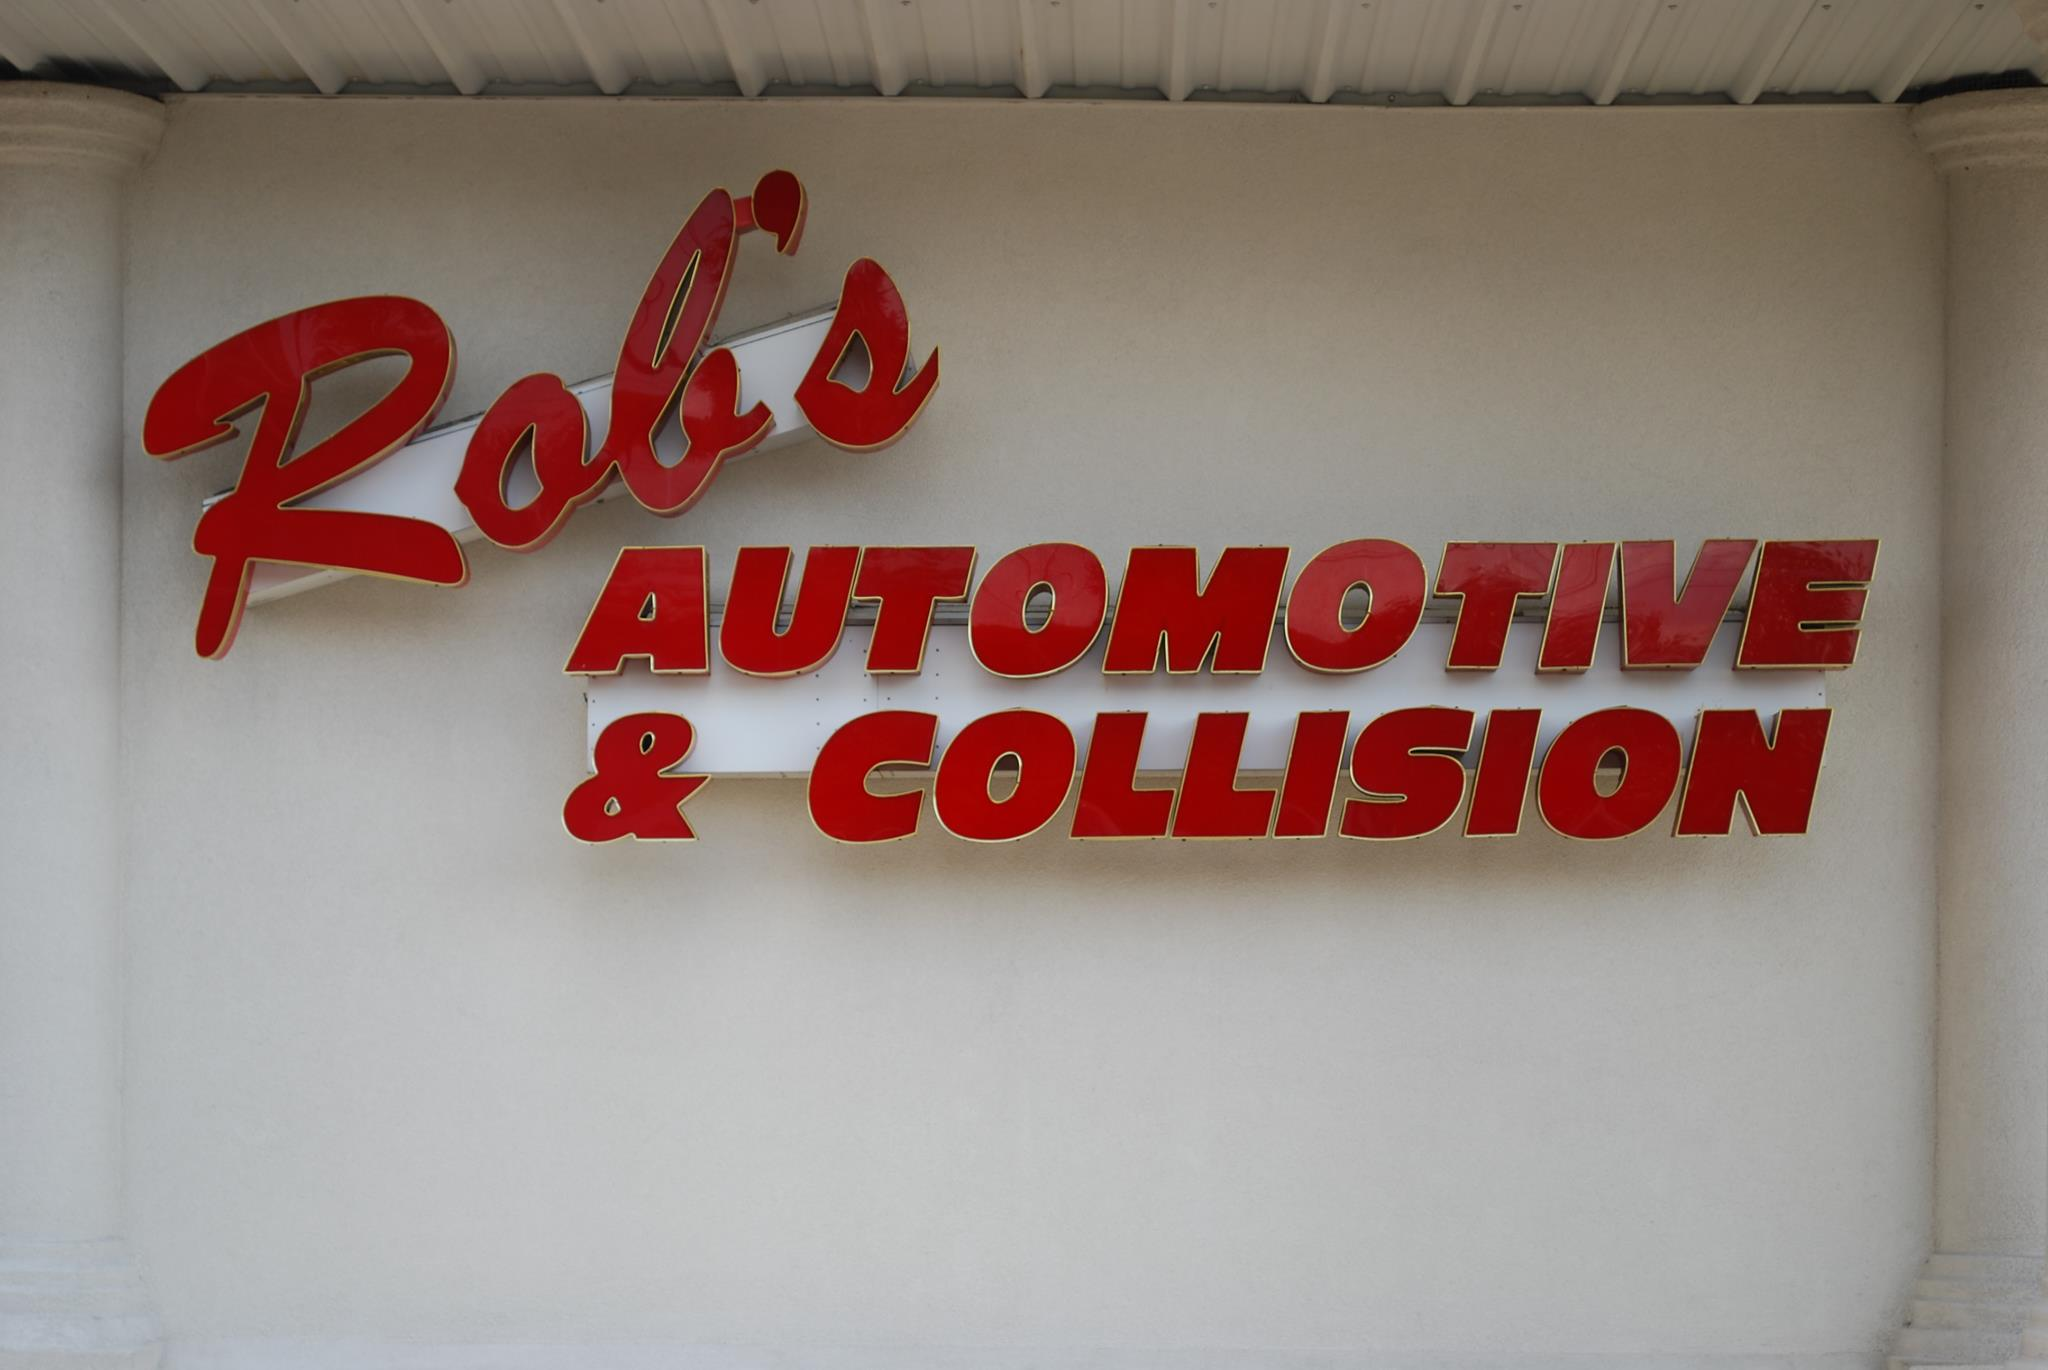 Rob's Truck Collision Center